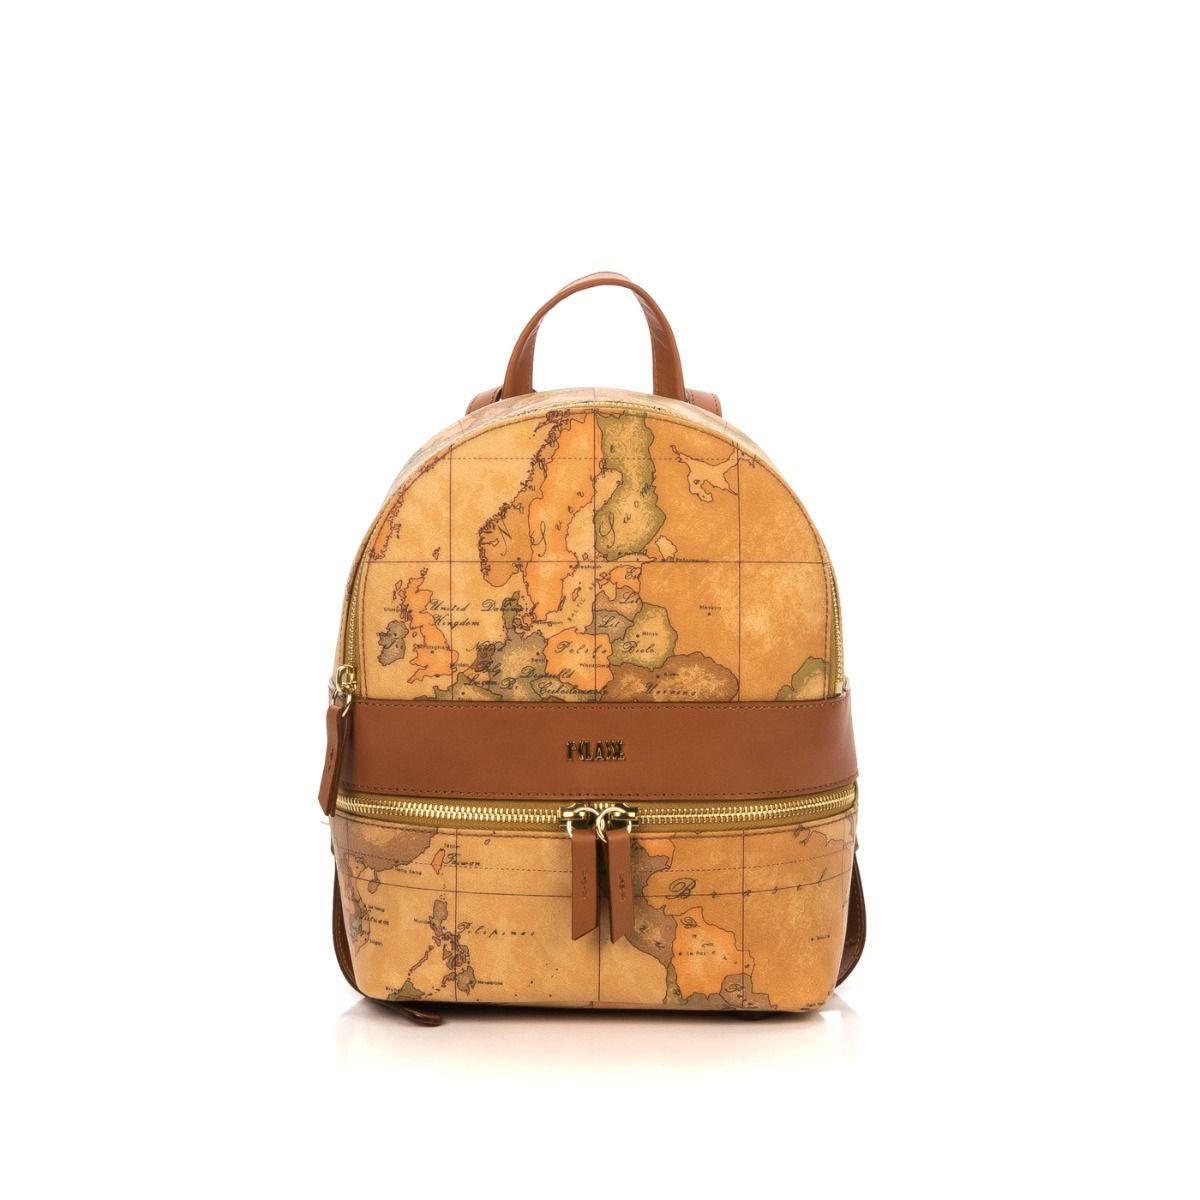 0b7d40d6bd Zaino donna|ALVIERO MARTINI 1^CLASSE D0986000-10 Geo Classic|Shop  online|Shoe Center